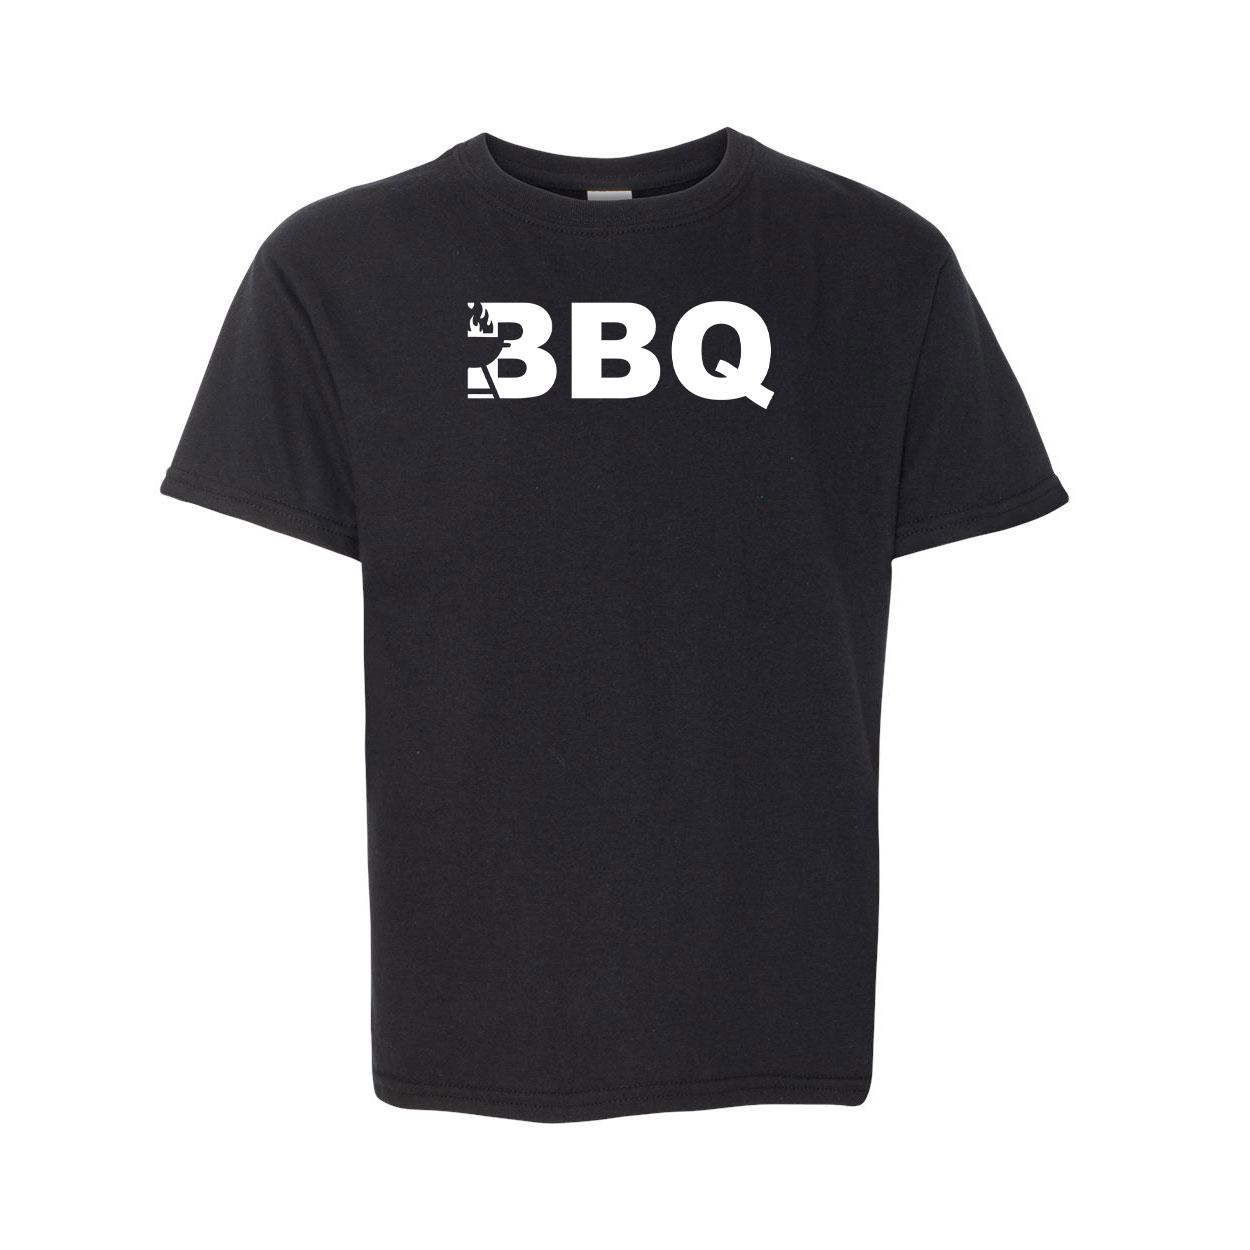 BBQ Grill Logo Classic Youth T-Shirt Black (White Logo)